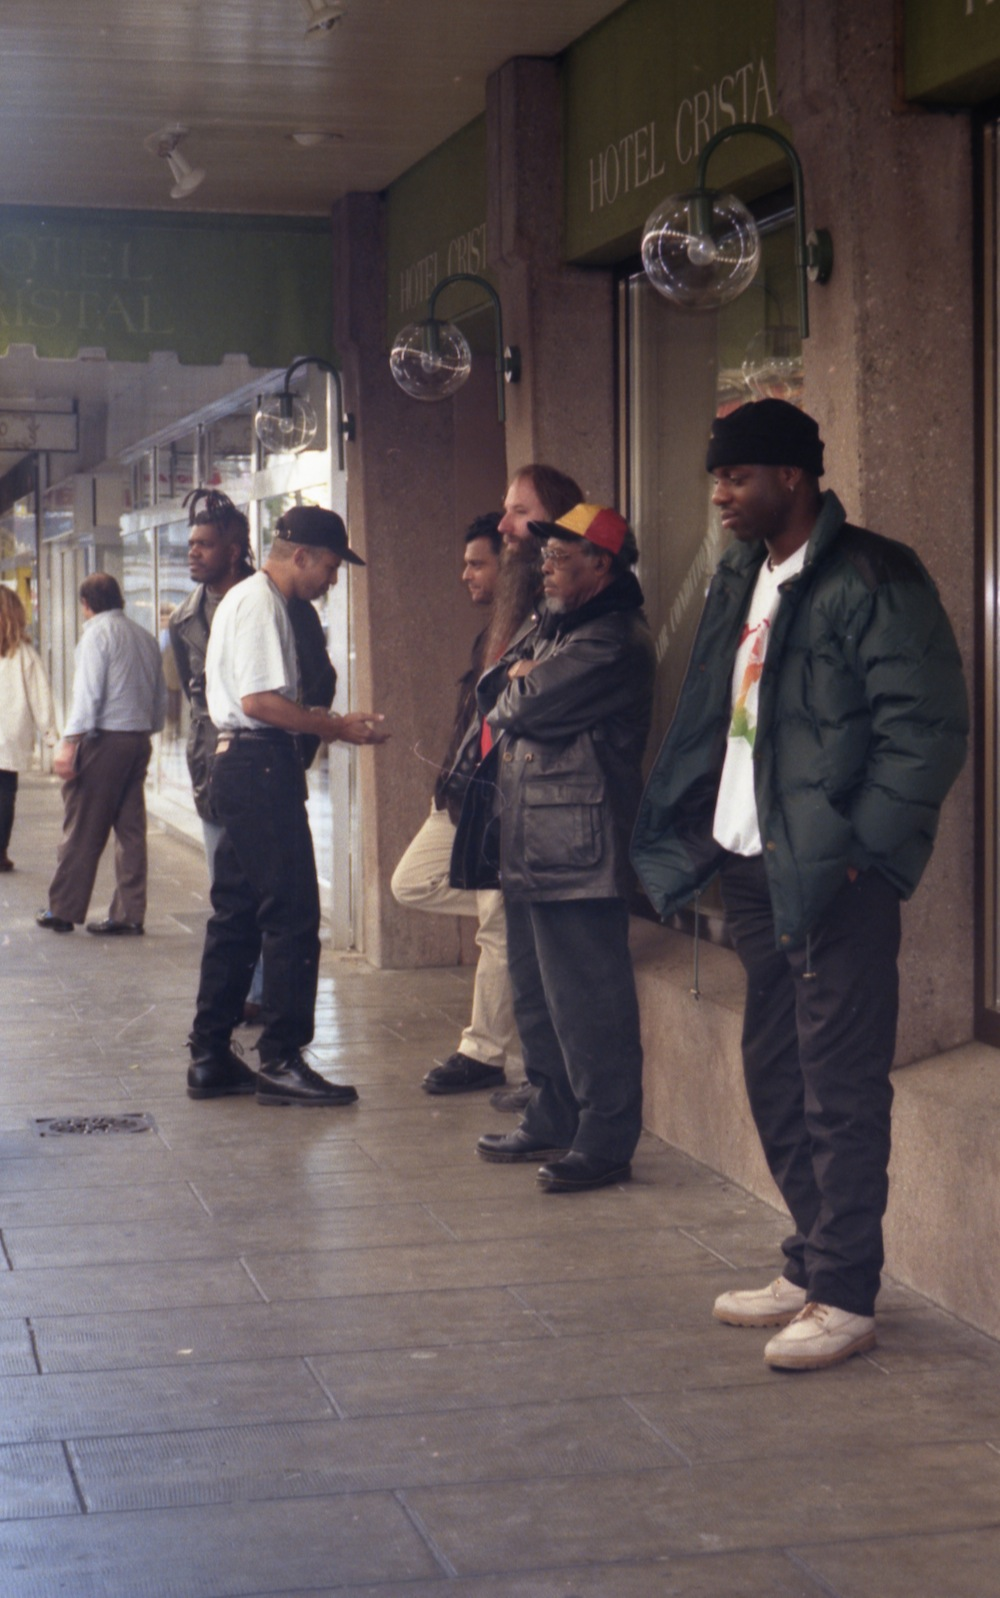 Kirk Thorne, Nathan Breedlove, Vin Gadher, Barney, Lloyd Knibb, Tony Looby, outside Hotel Crista, Geneva 1996